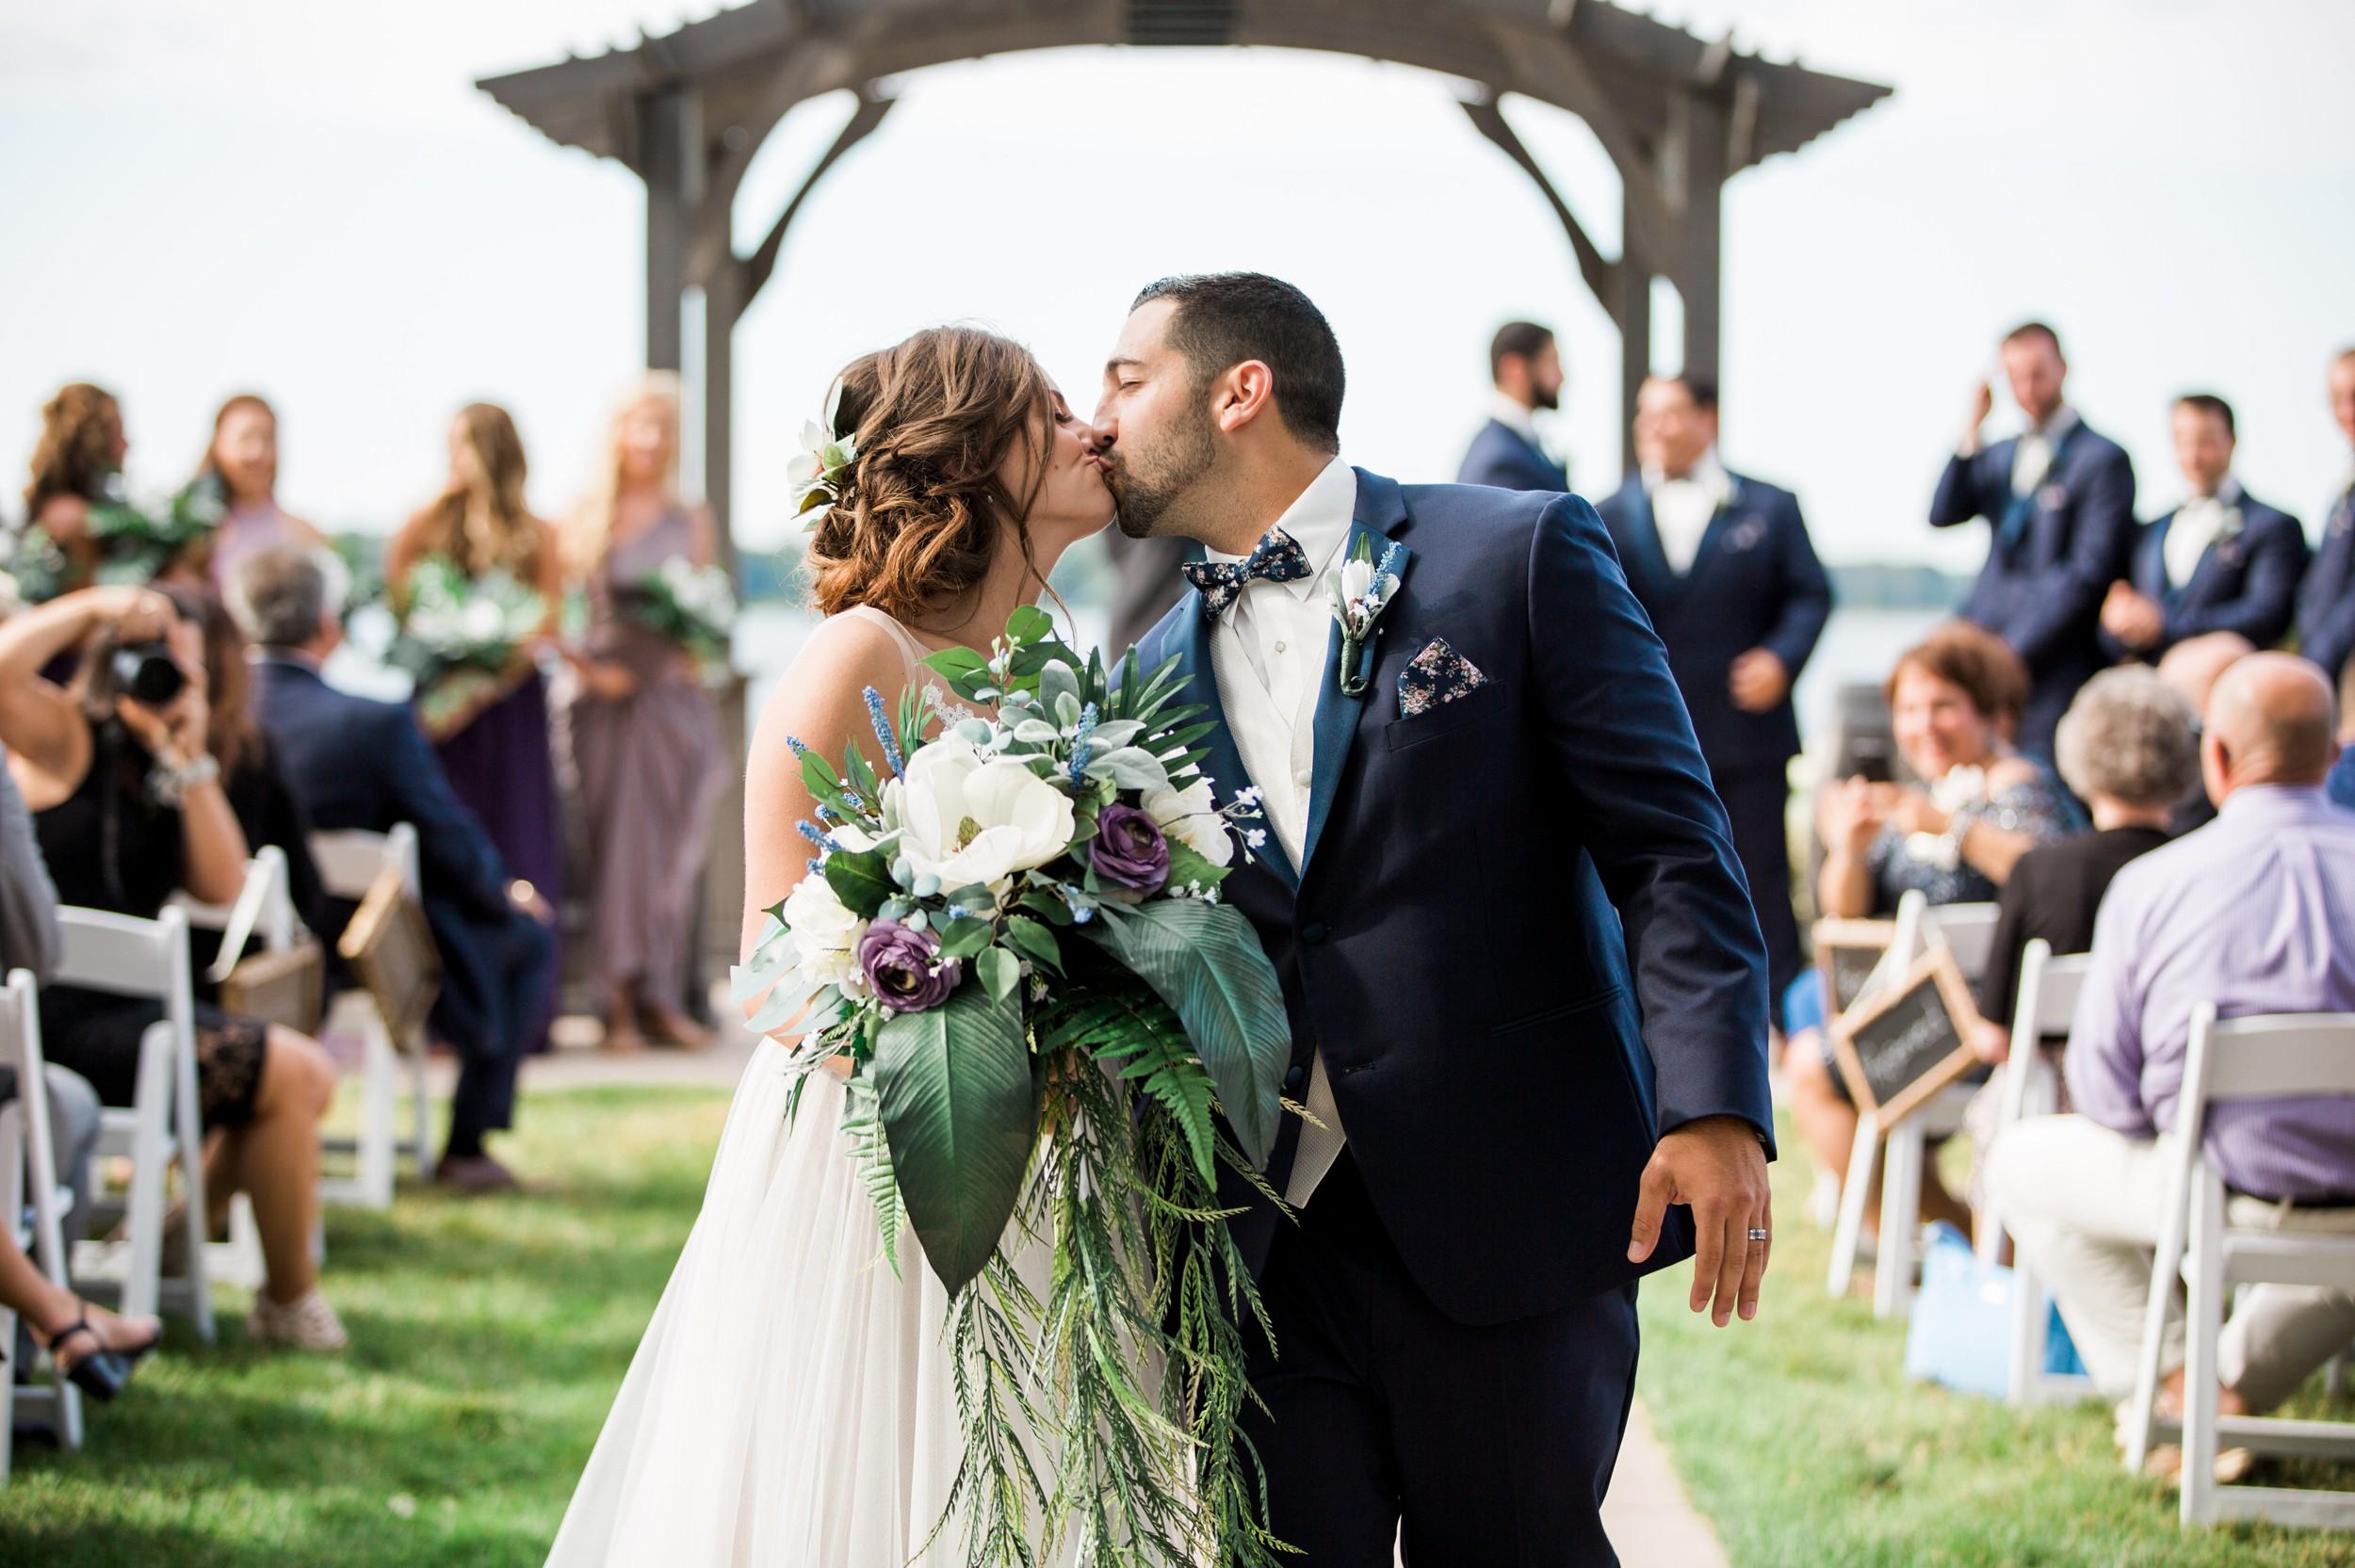 Nick-and-martina-pinelake-vinyards-wedding-columbiana-ohio-tracylynn-photography 6.jpg